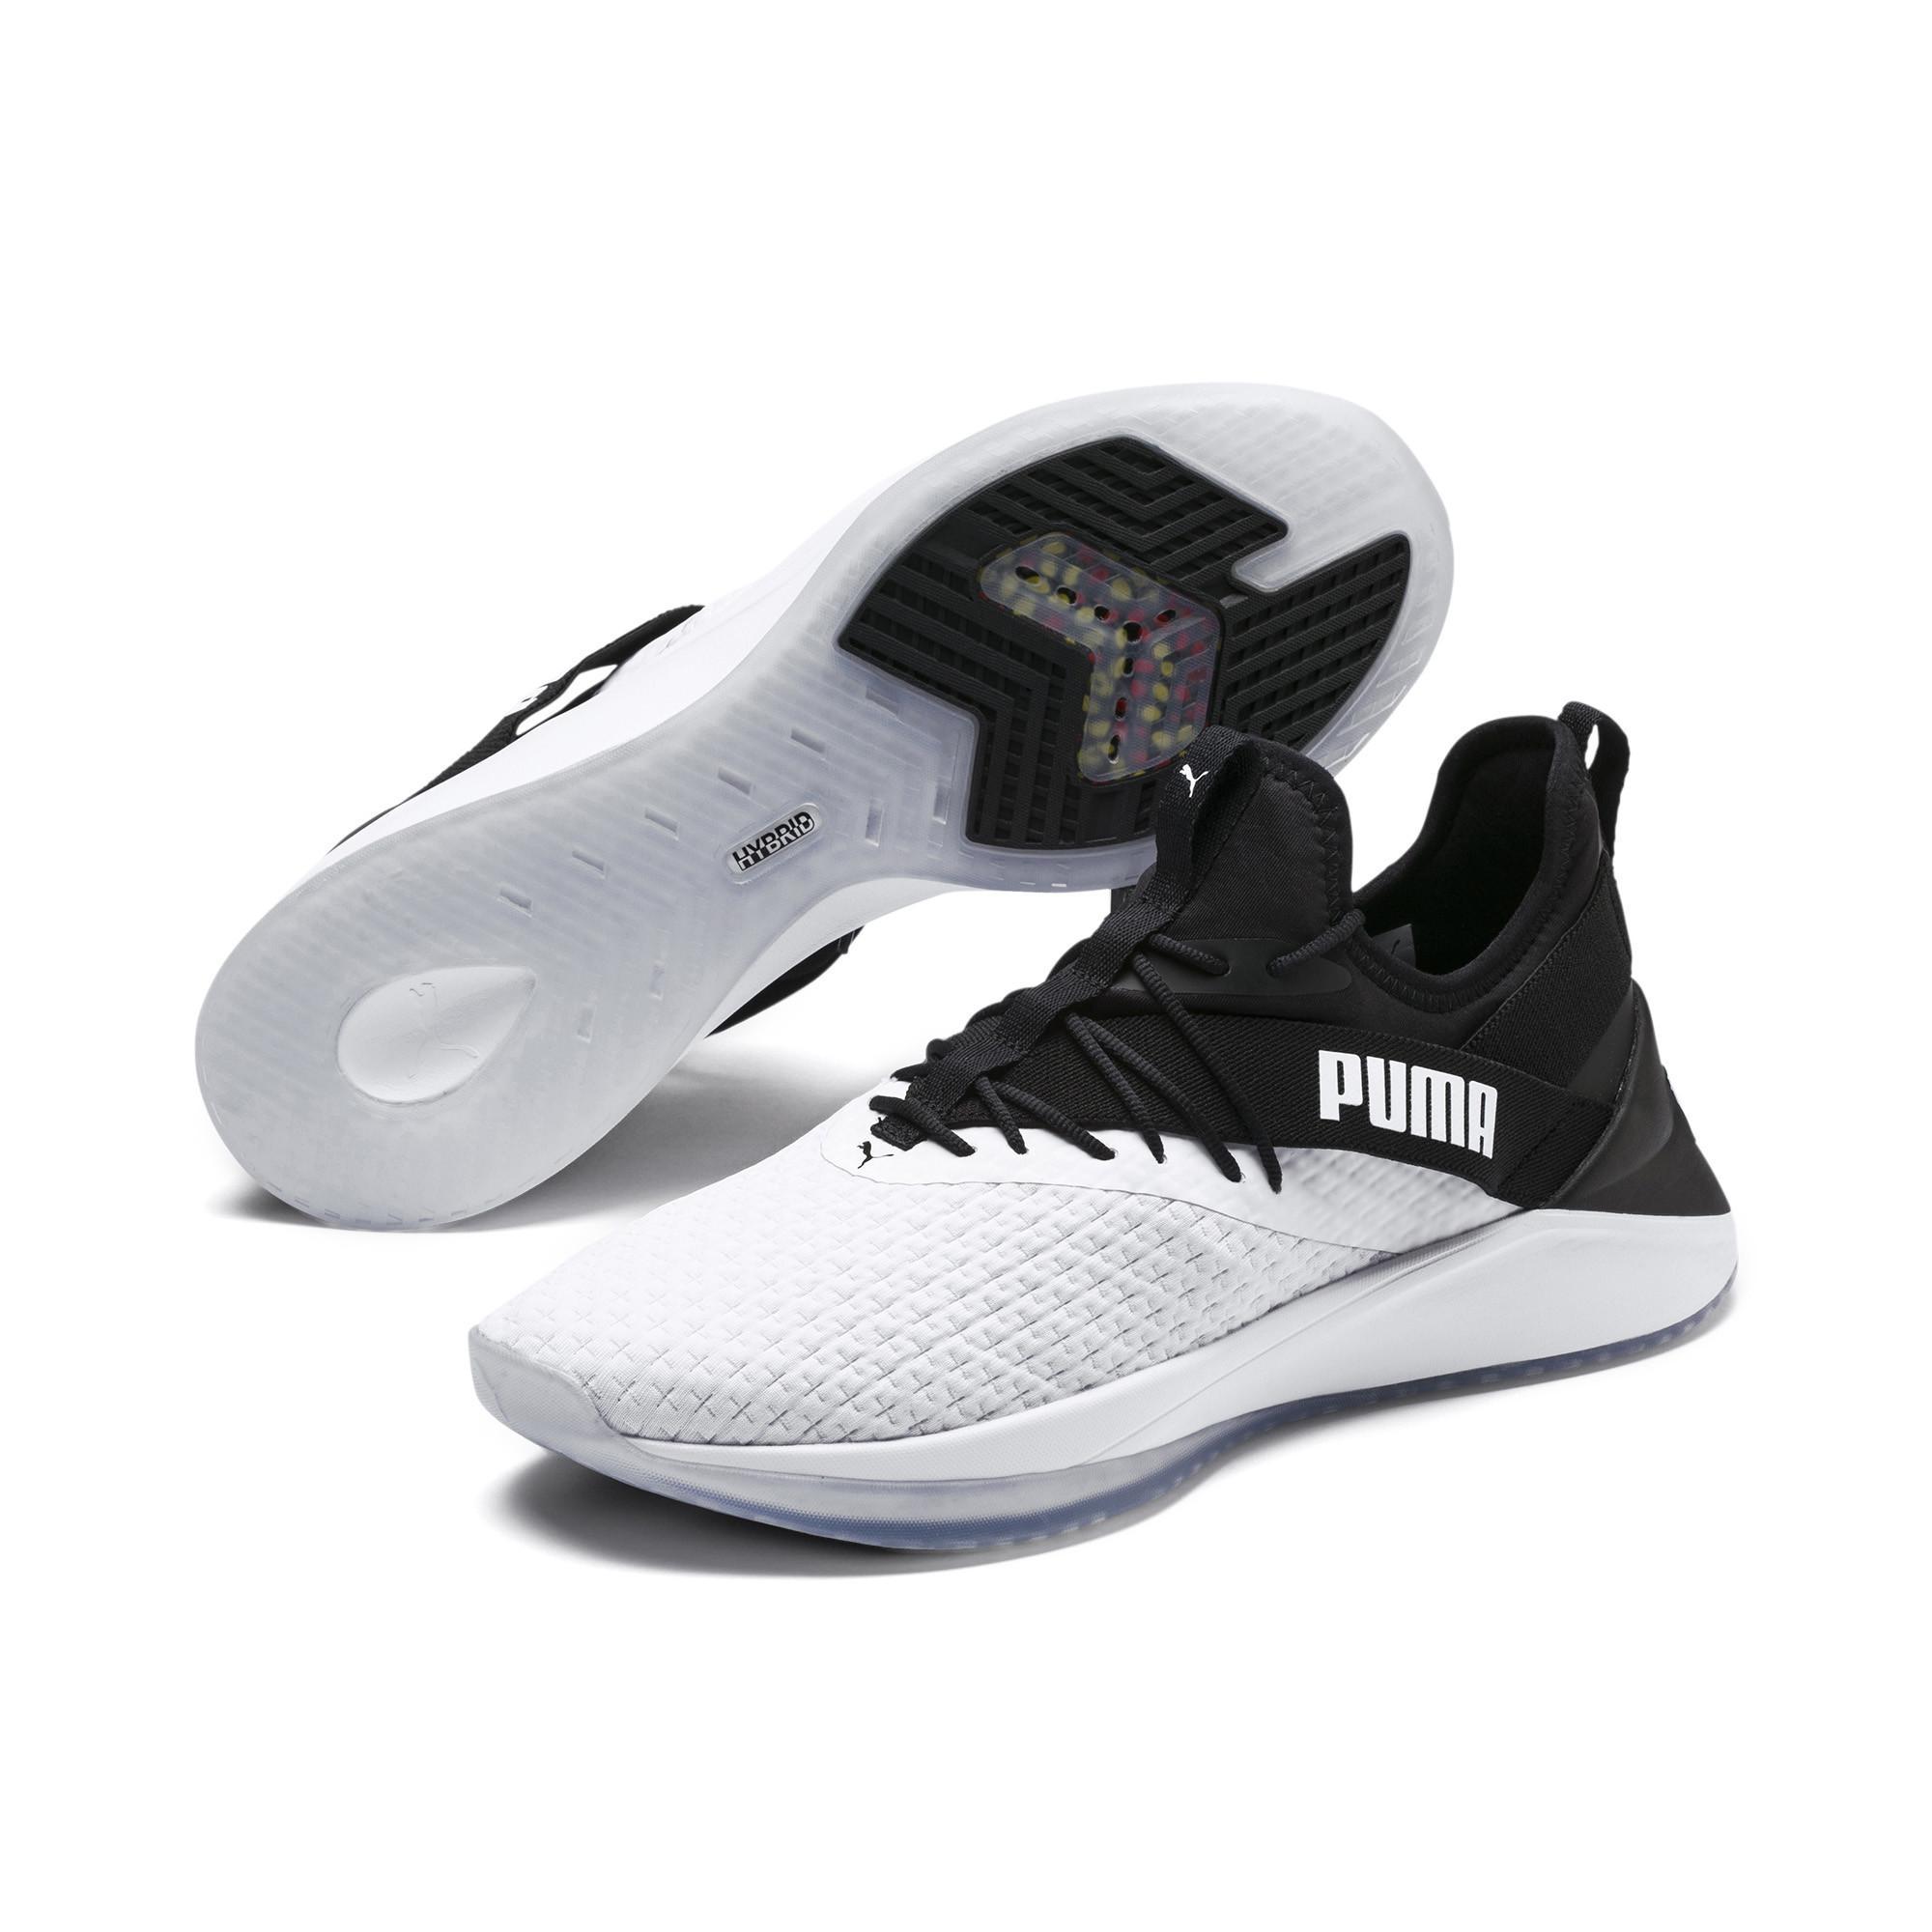 Jaab Xt Men's Training Shoes